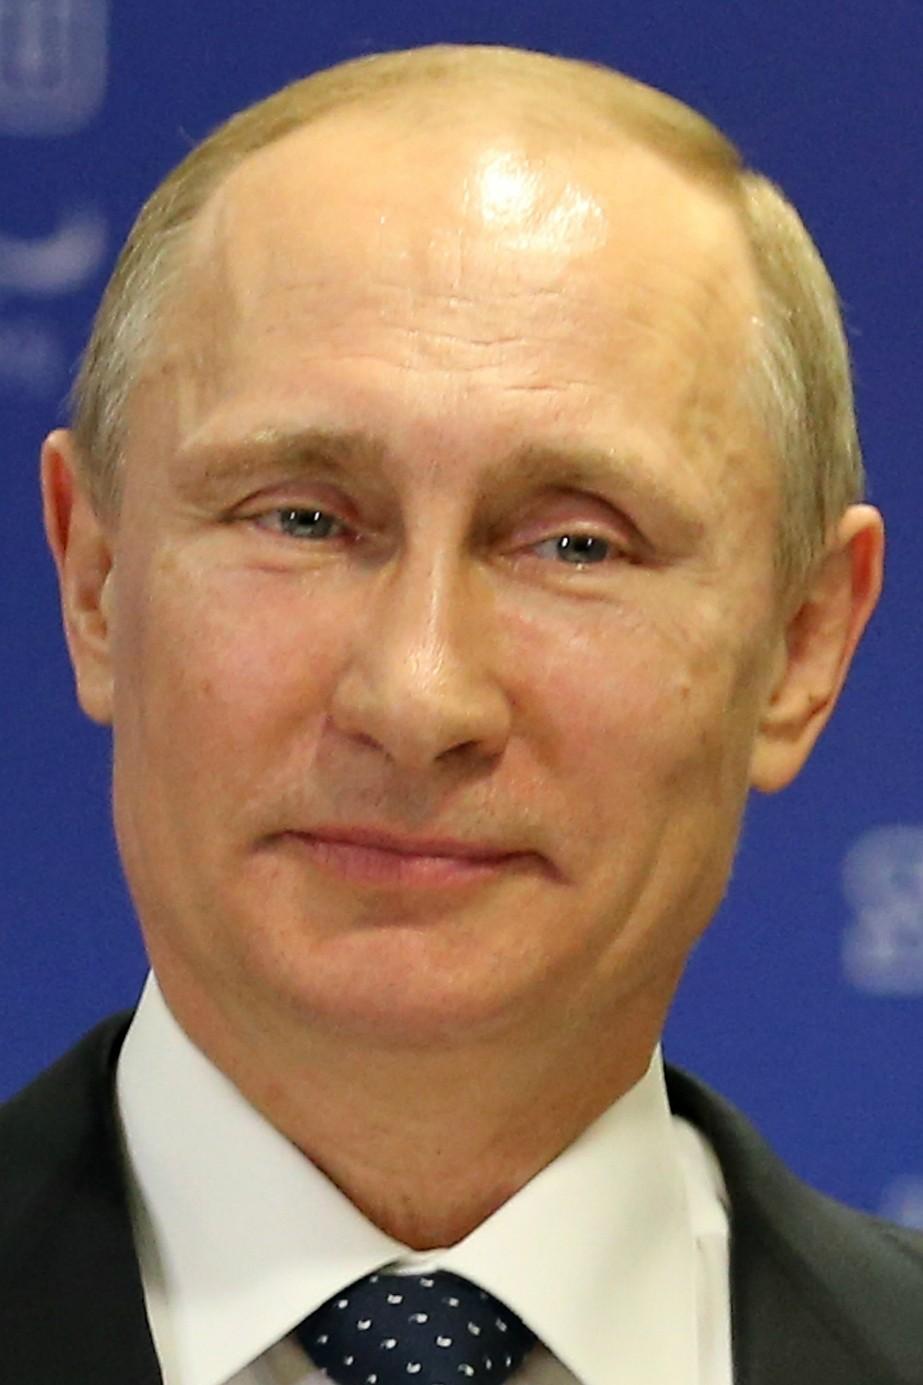 O presidente russo Vladimir Putin (Foto: Getty Images)